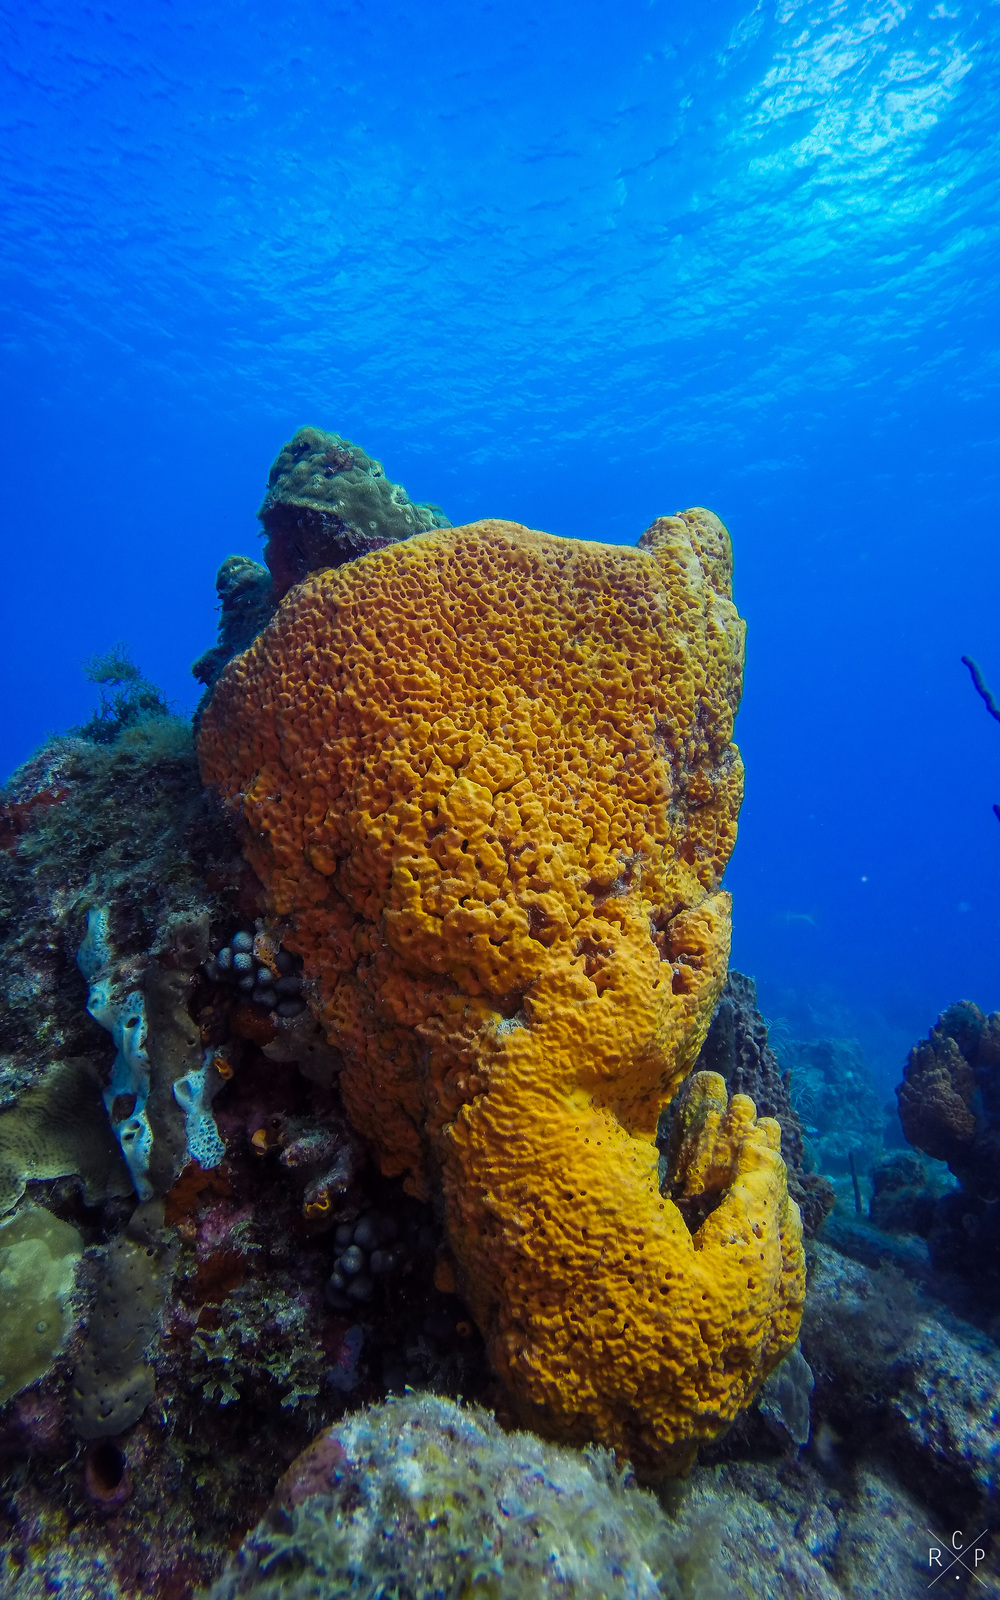 Orange Coral - La Piscine, Jacque Cousteau Underwater Reserve, Guadeloupe 11/04/2016